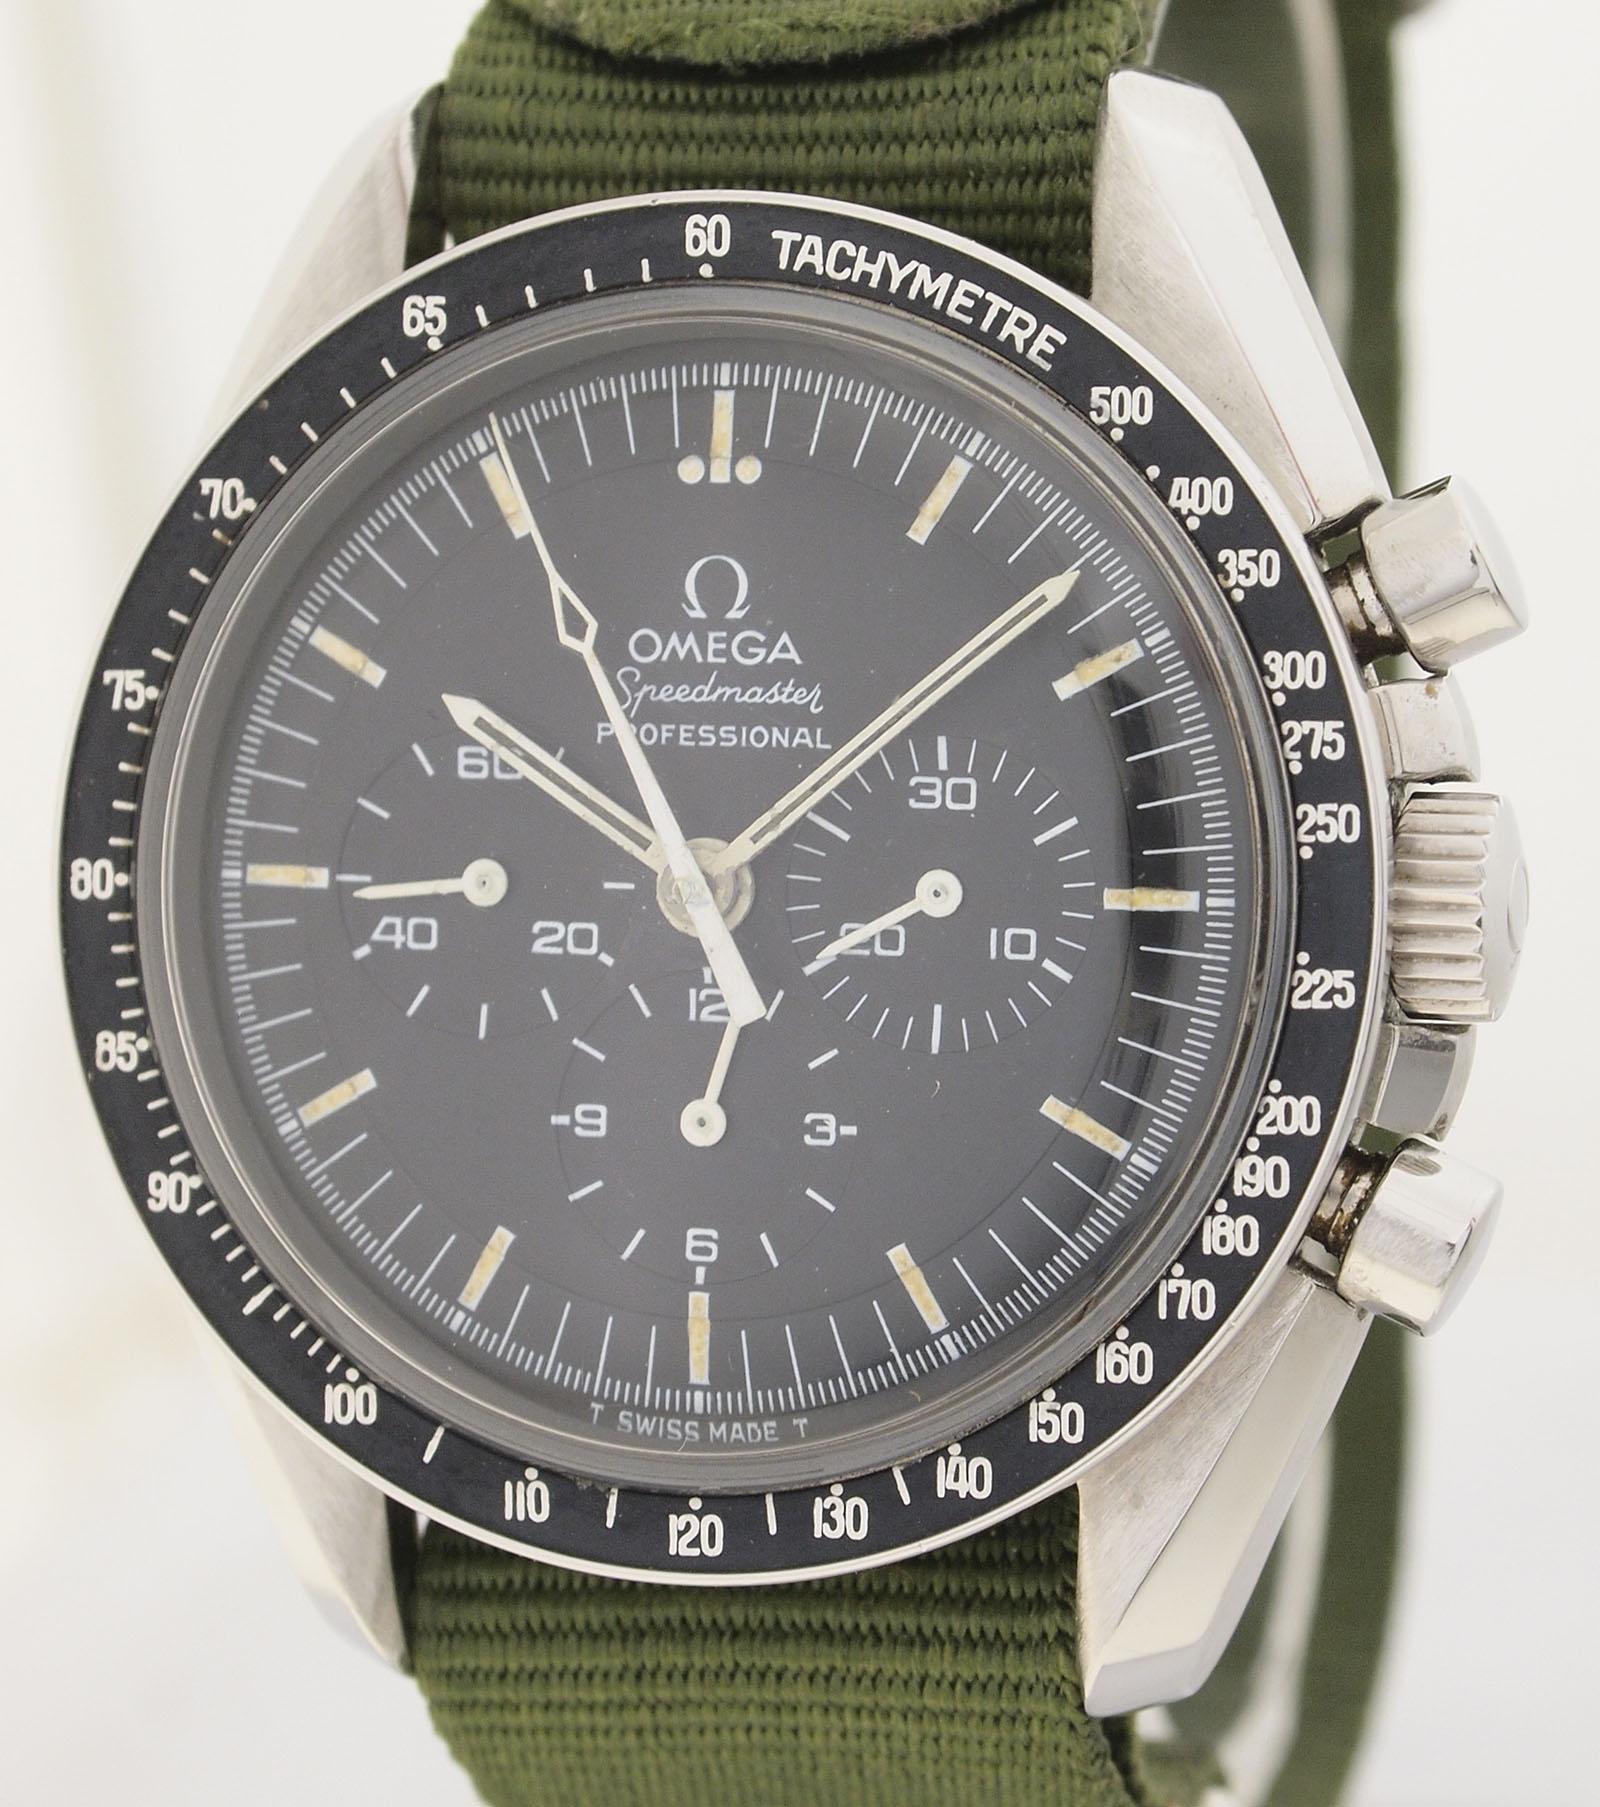 Omega Speedmaster Prof.v.1971 Cal 861-first watch worn on ...